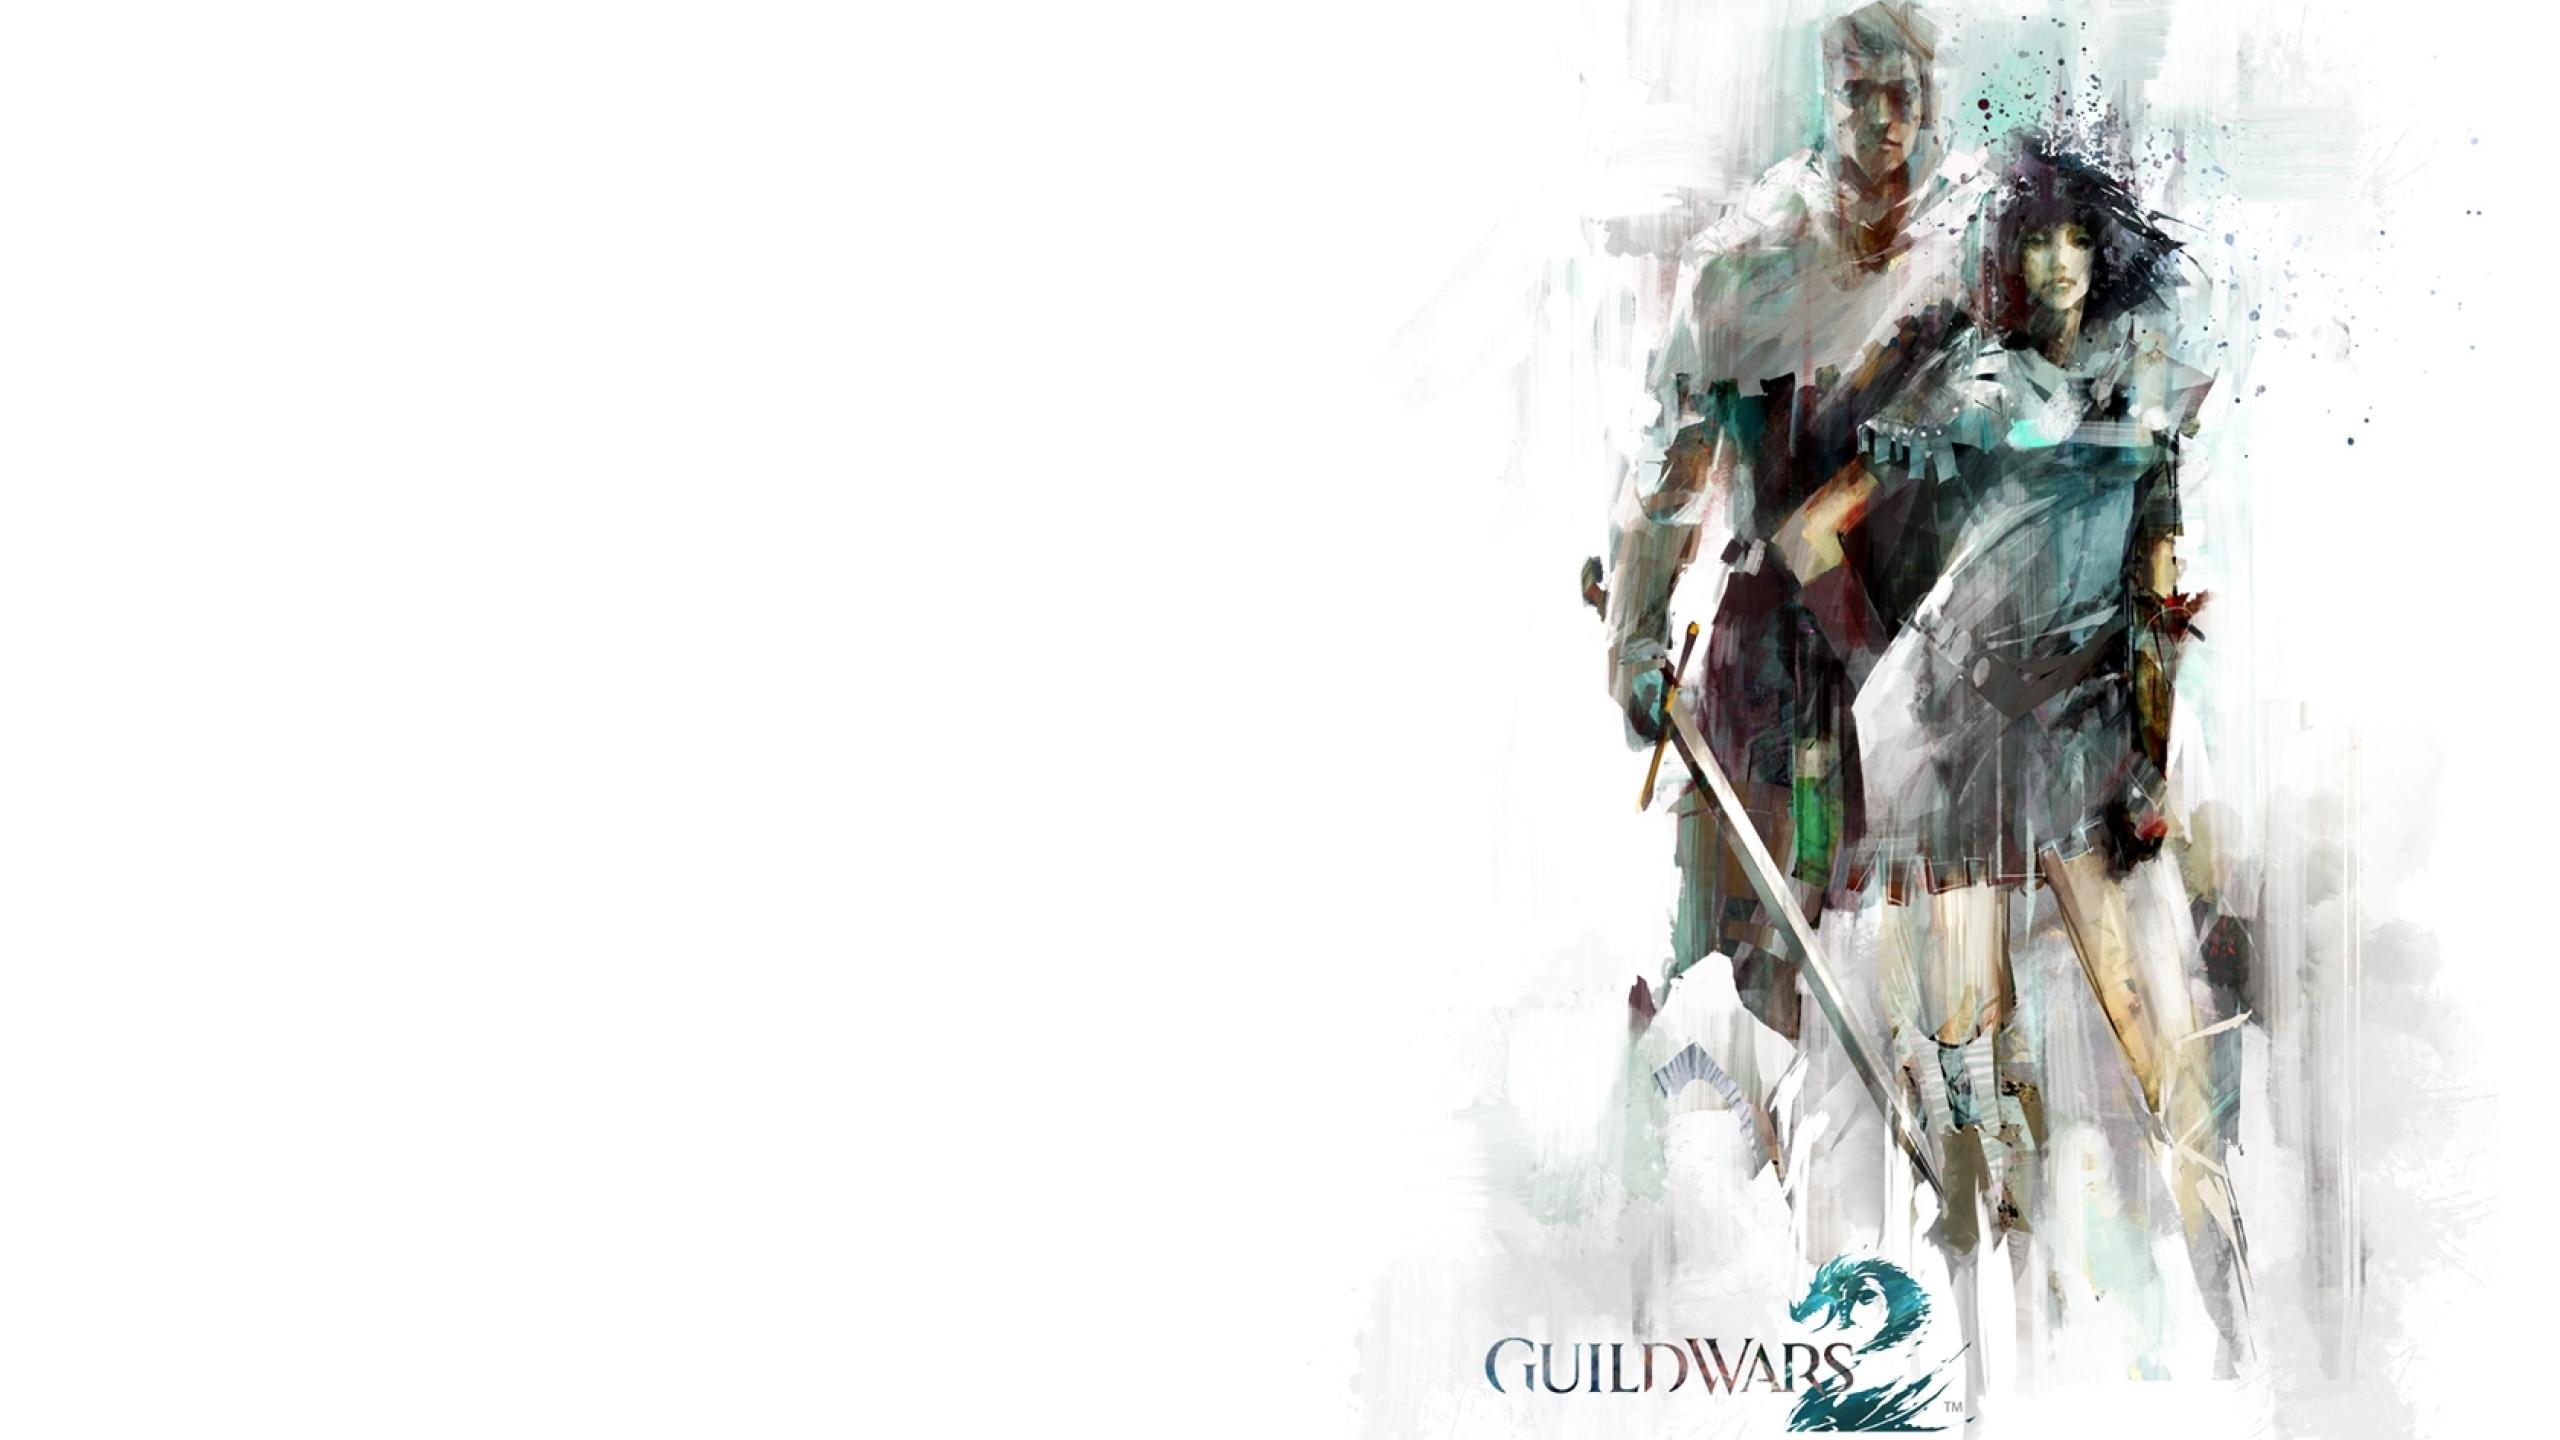 2560x1440 Guild Wars 2 Man Female 1440p Resolution Wallpaper Hd